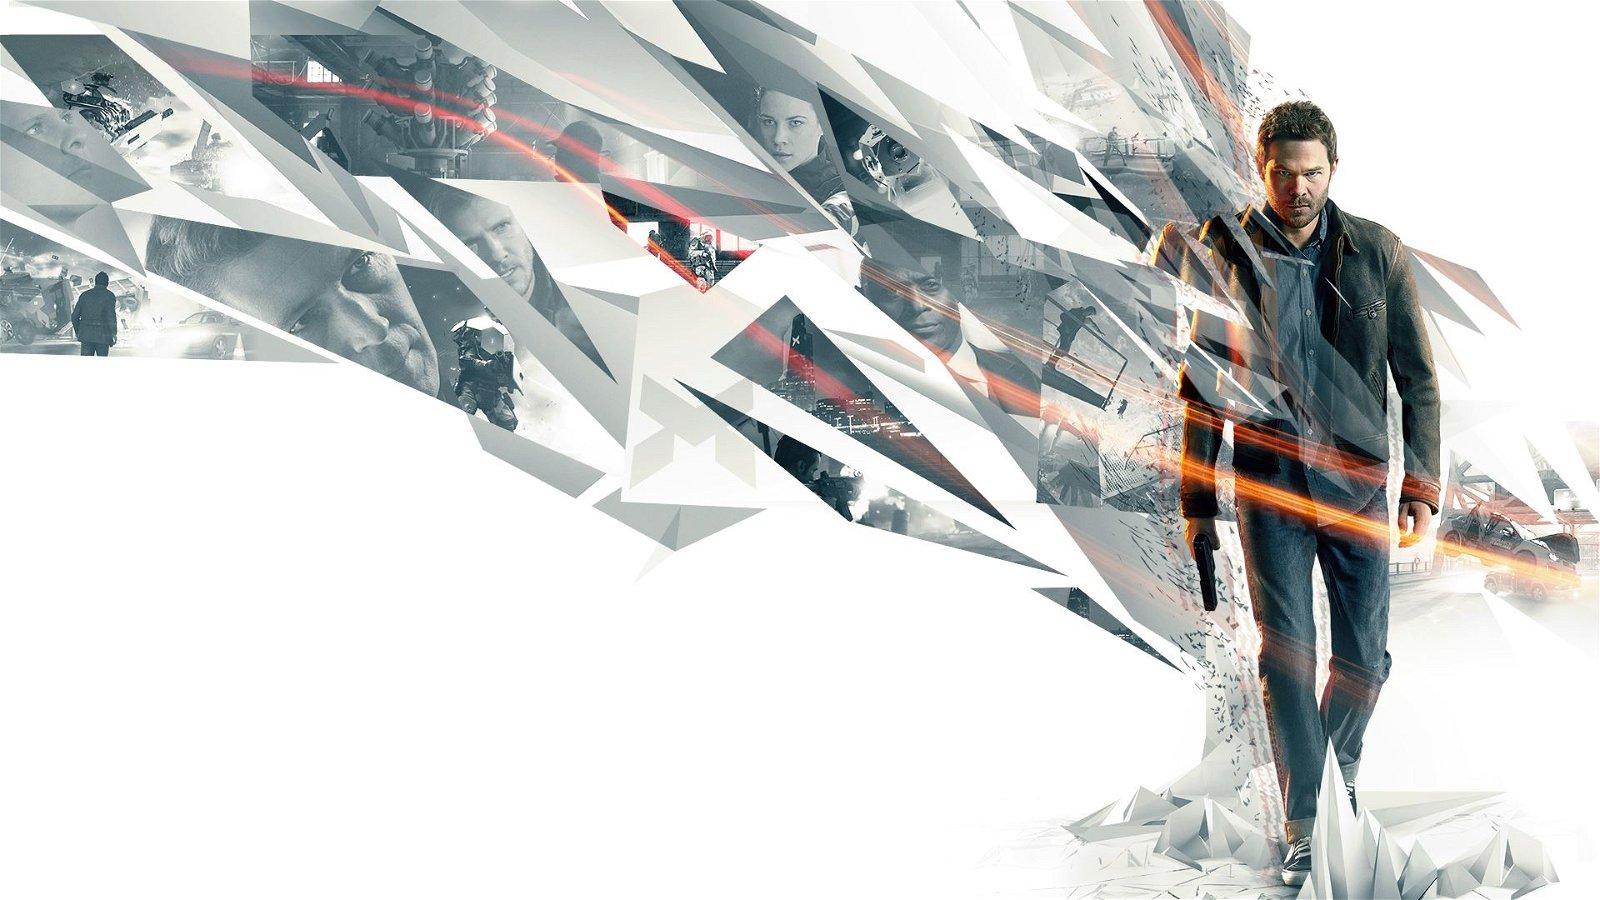 Interview: Thomas Puha of Remedy Entertainment on Quantum Break 5